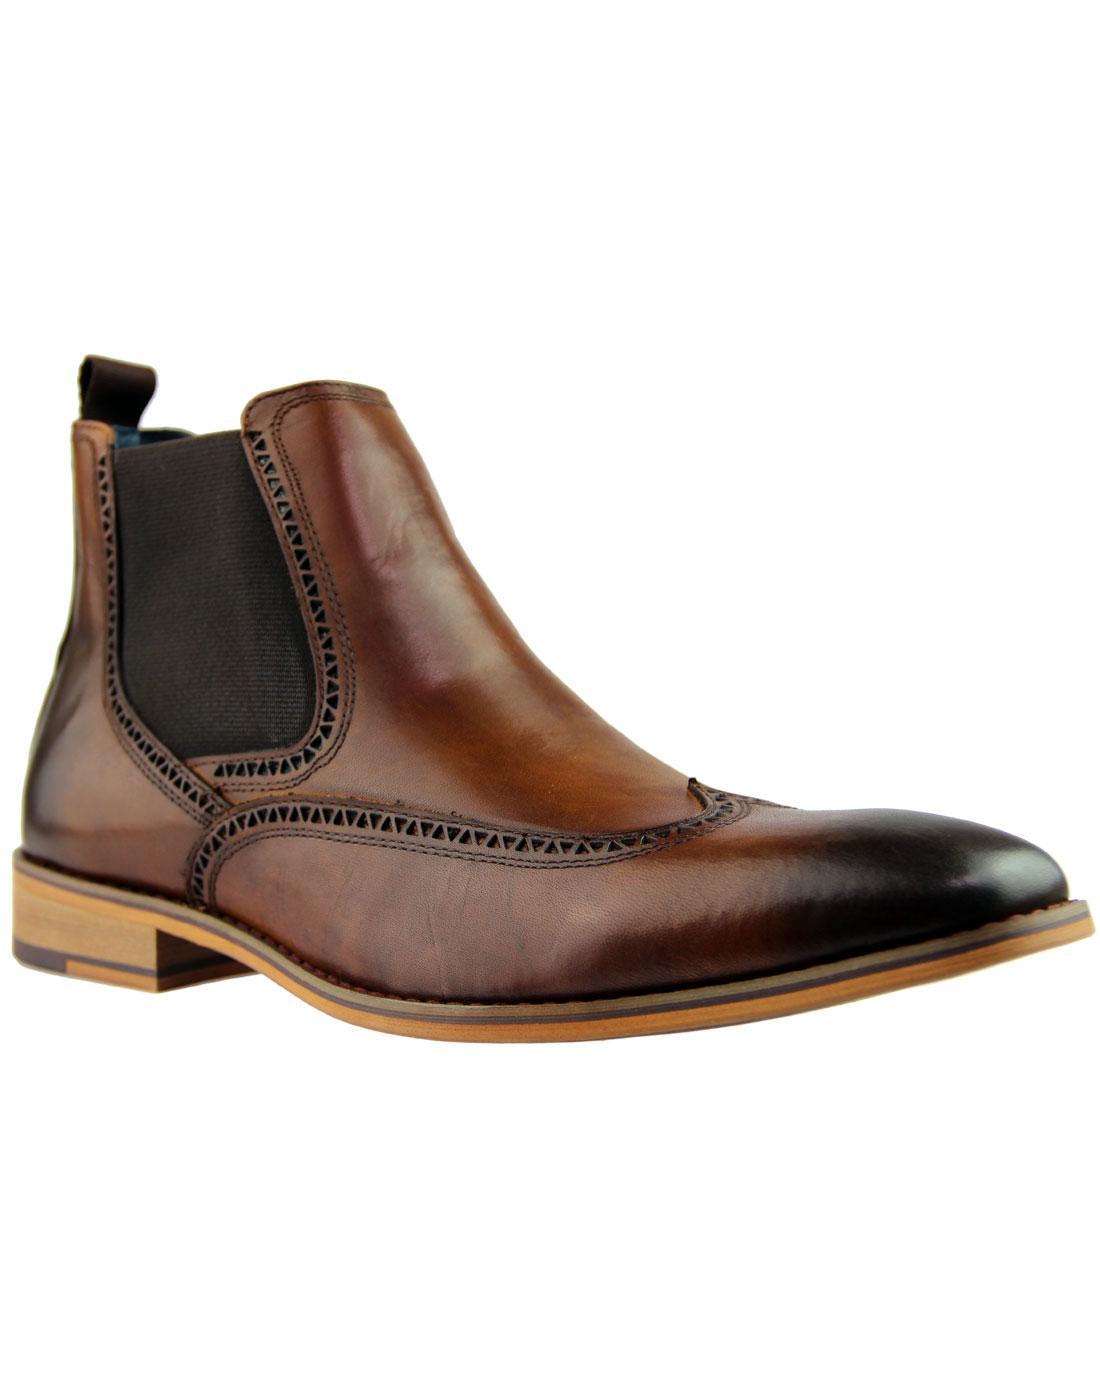 Talman PAOLO VANDINI 60s Mod Brogue Chelsea Boots